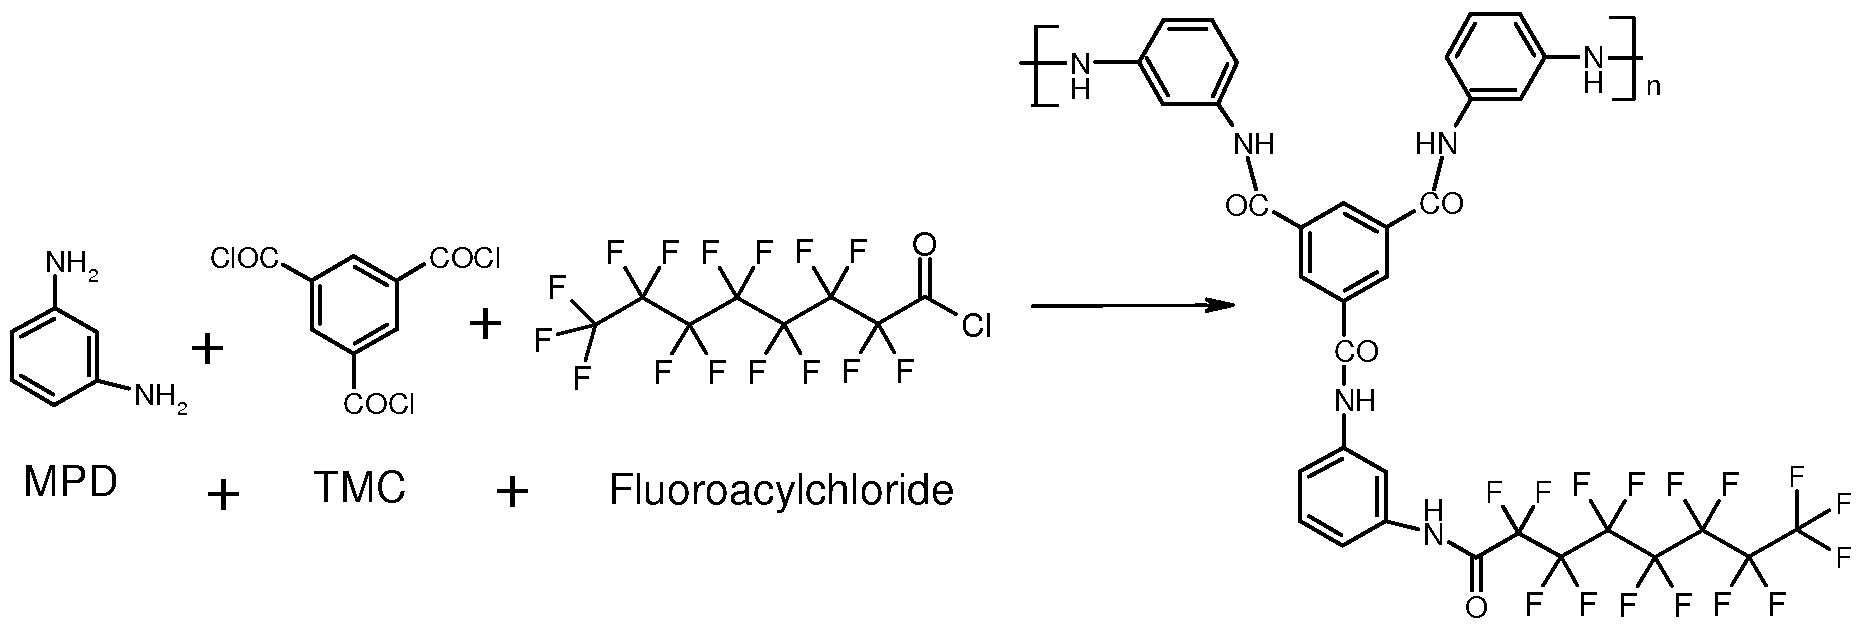 potent fluorinated corticosteroids